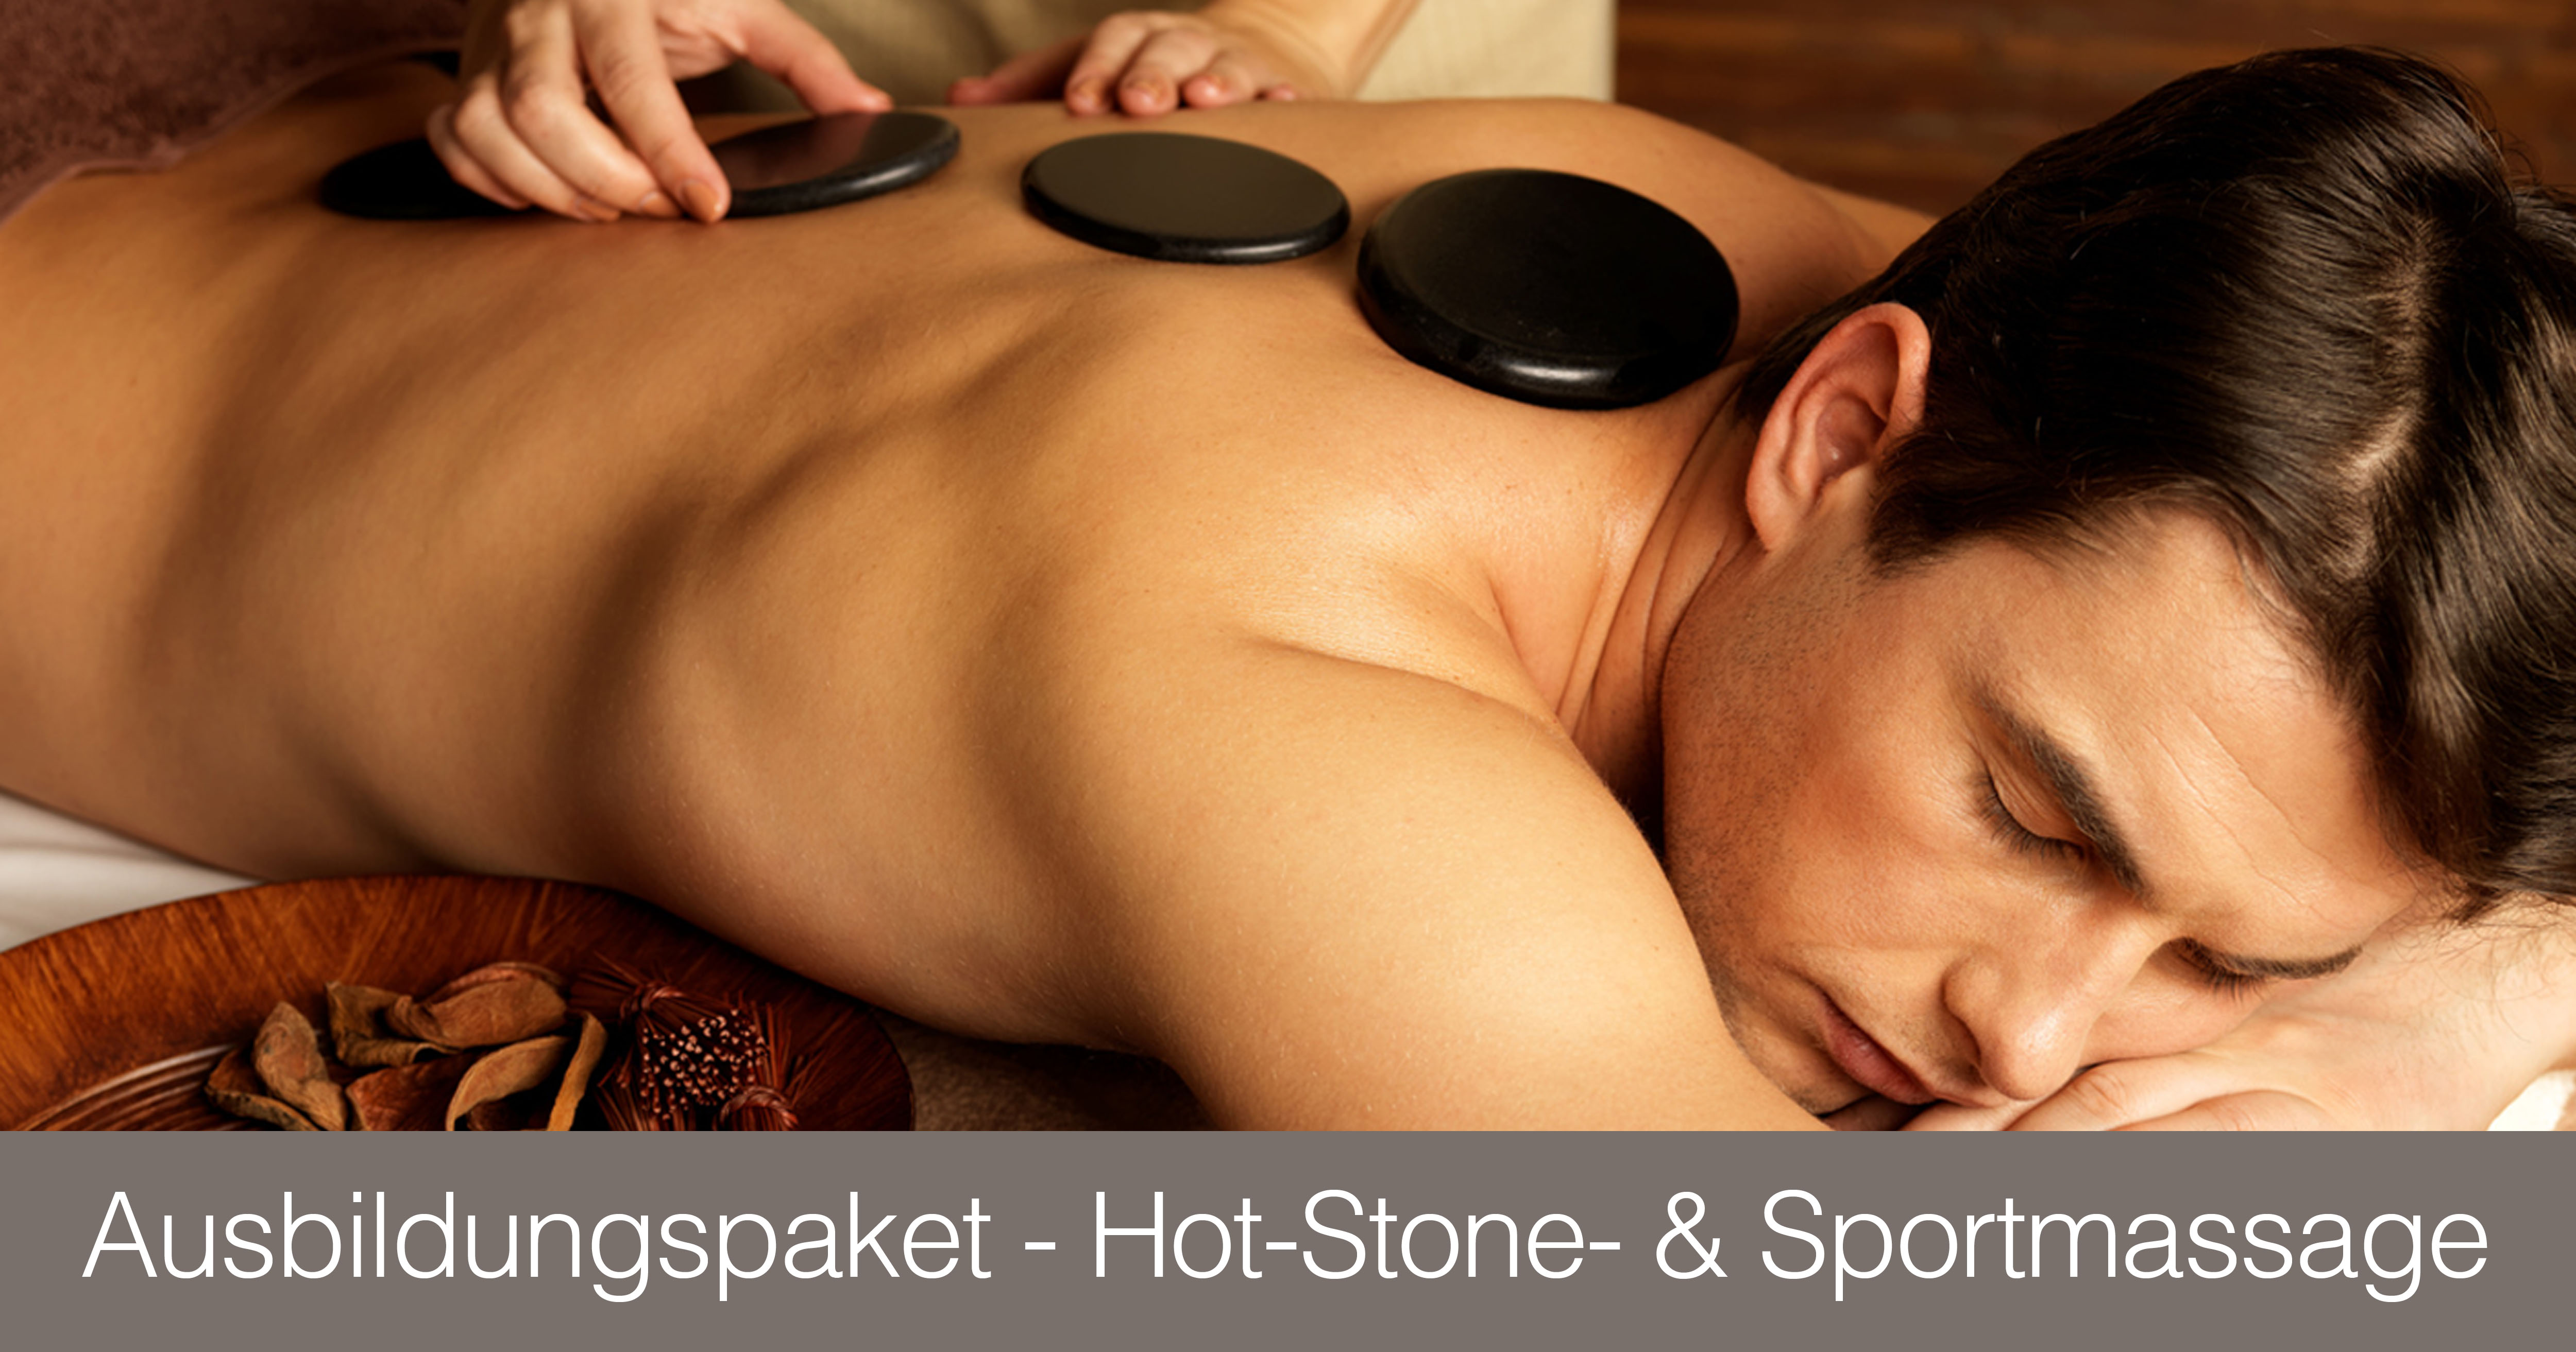 Ausbildunsgpaket Hot-Stone + Sportmassage